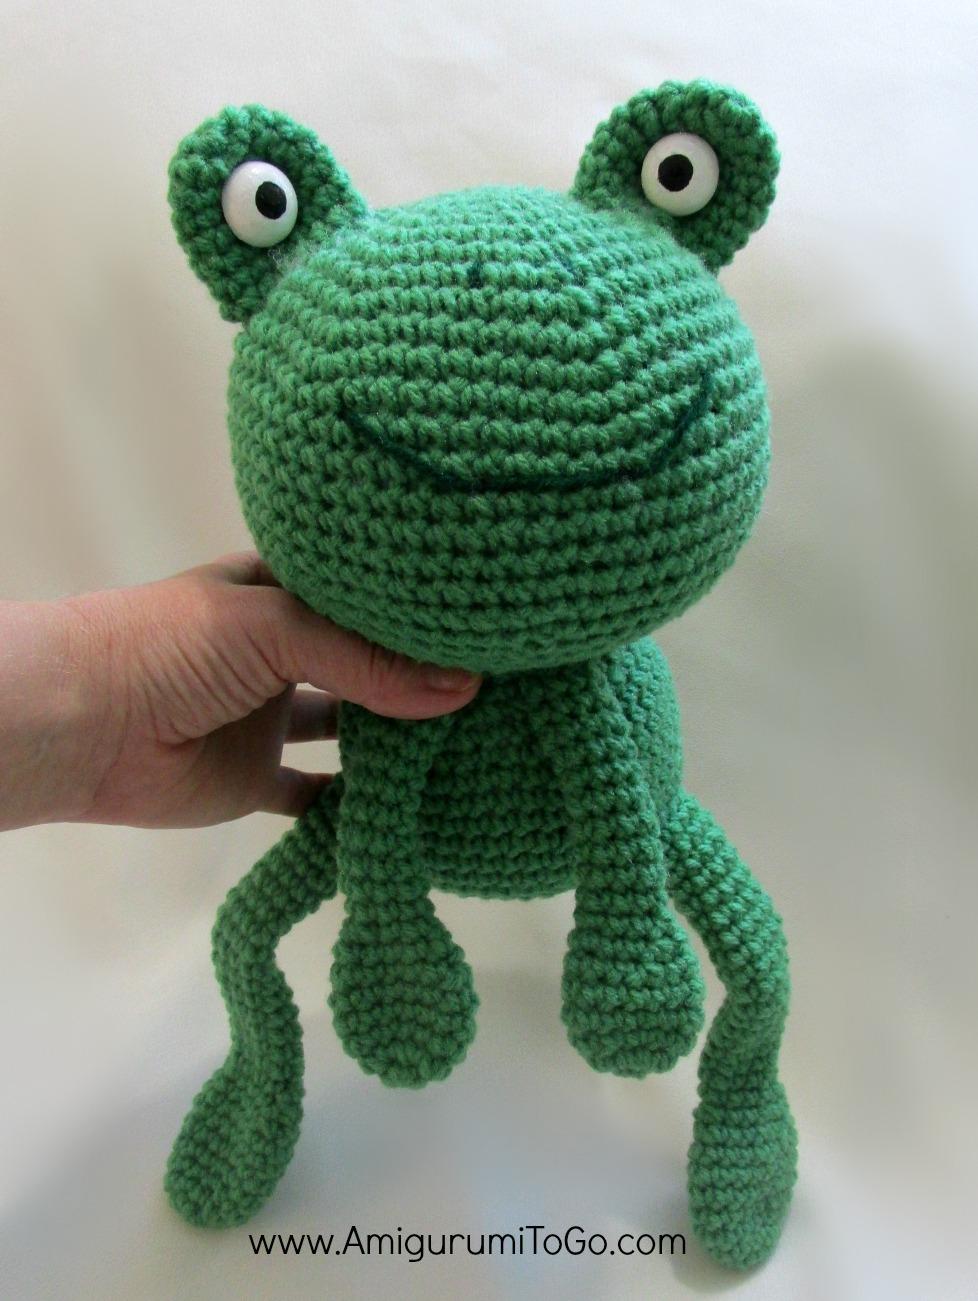 Amigurumi birthday frog amigurumi to go amigurumi birthday frog bankloansurffo Gallery